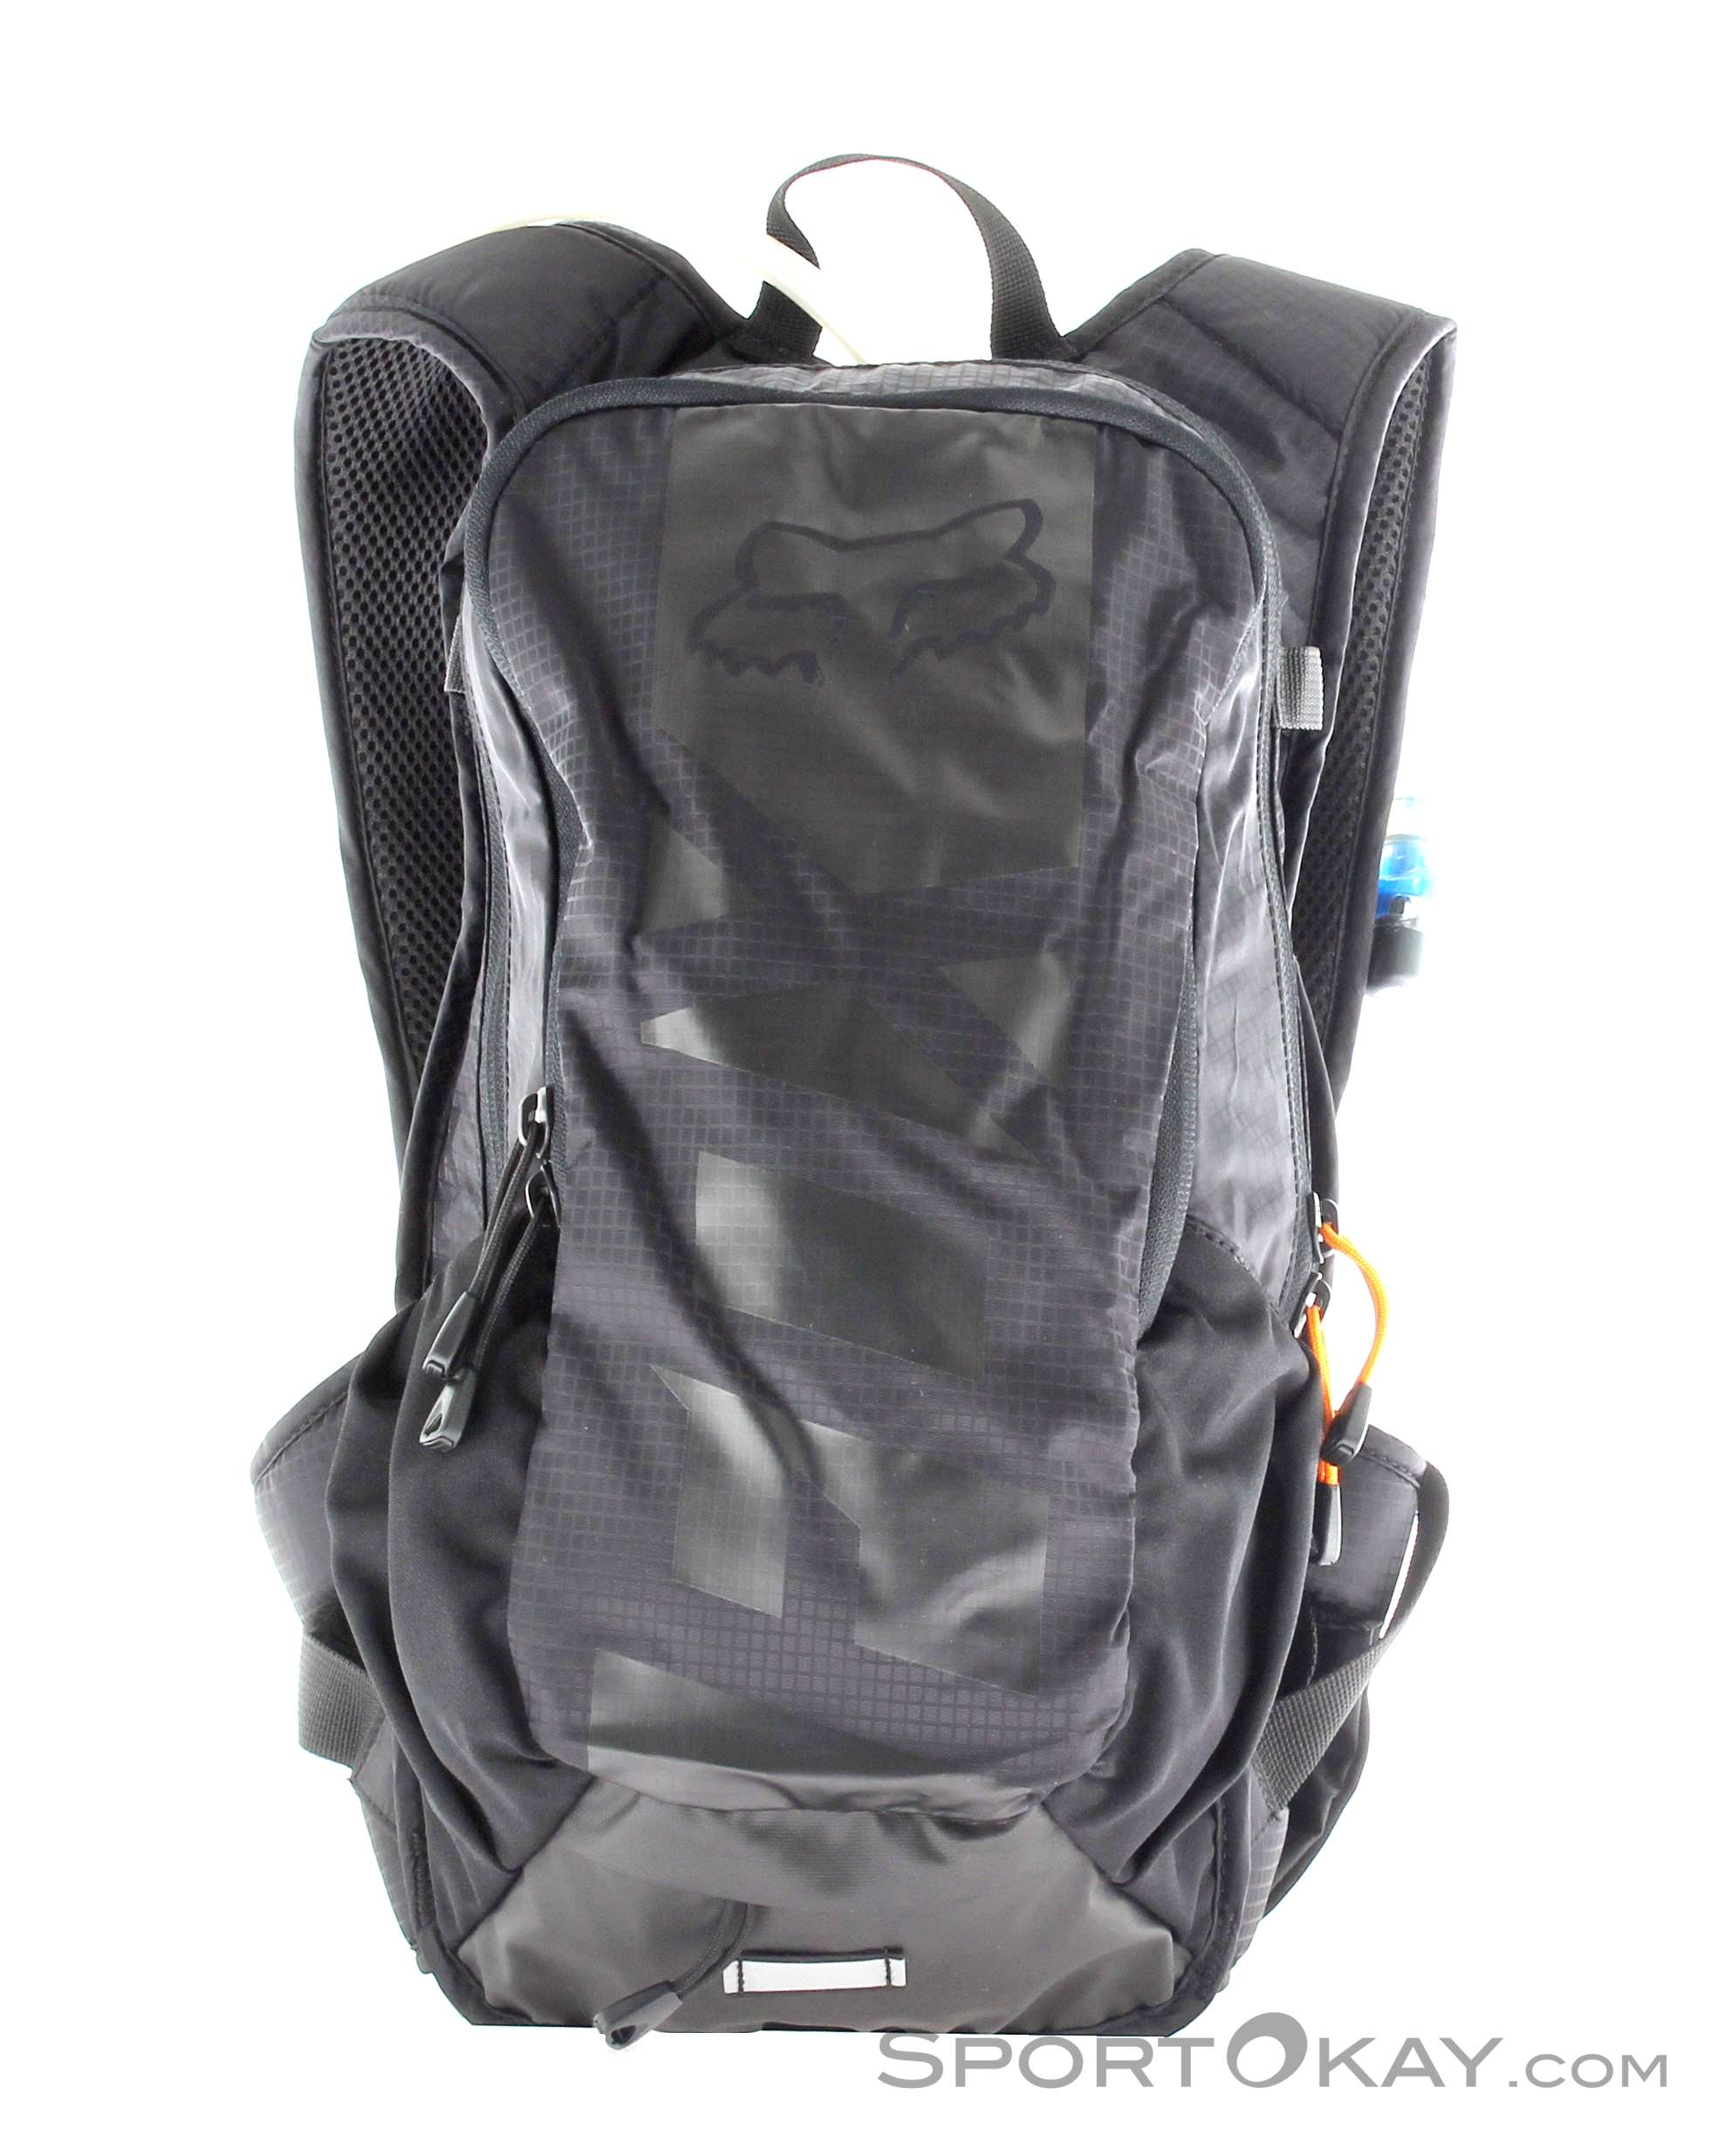 de5b19c0c8d5 Fox Fox Small Camber Race D30 10l Backpack